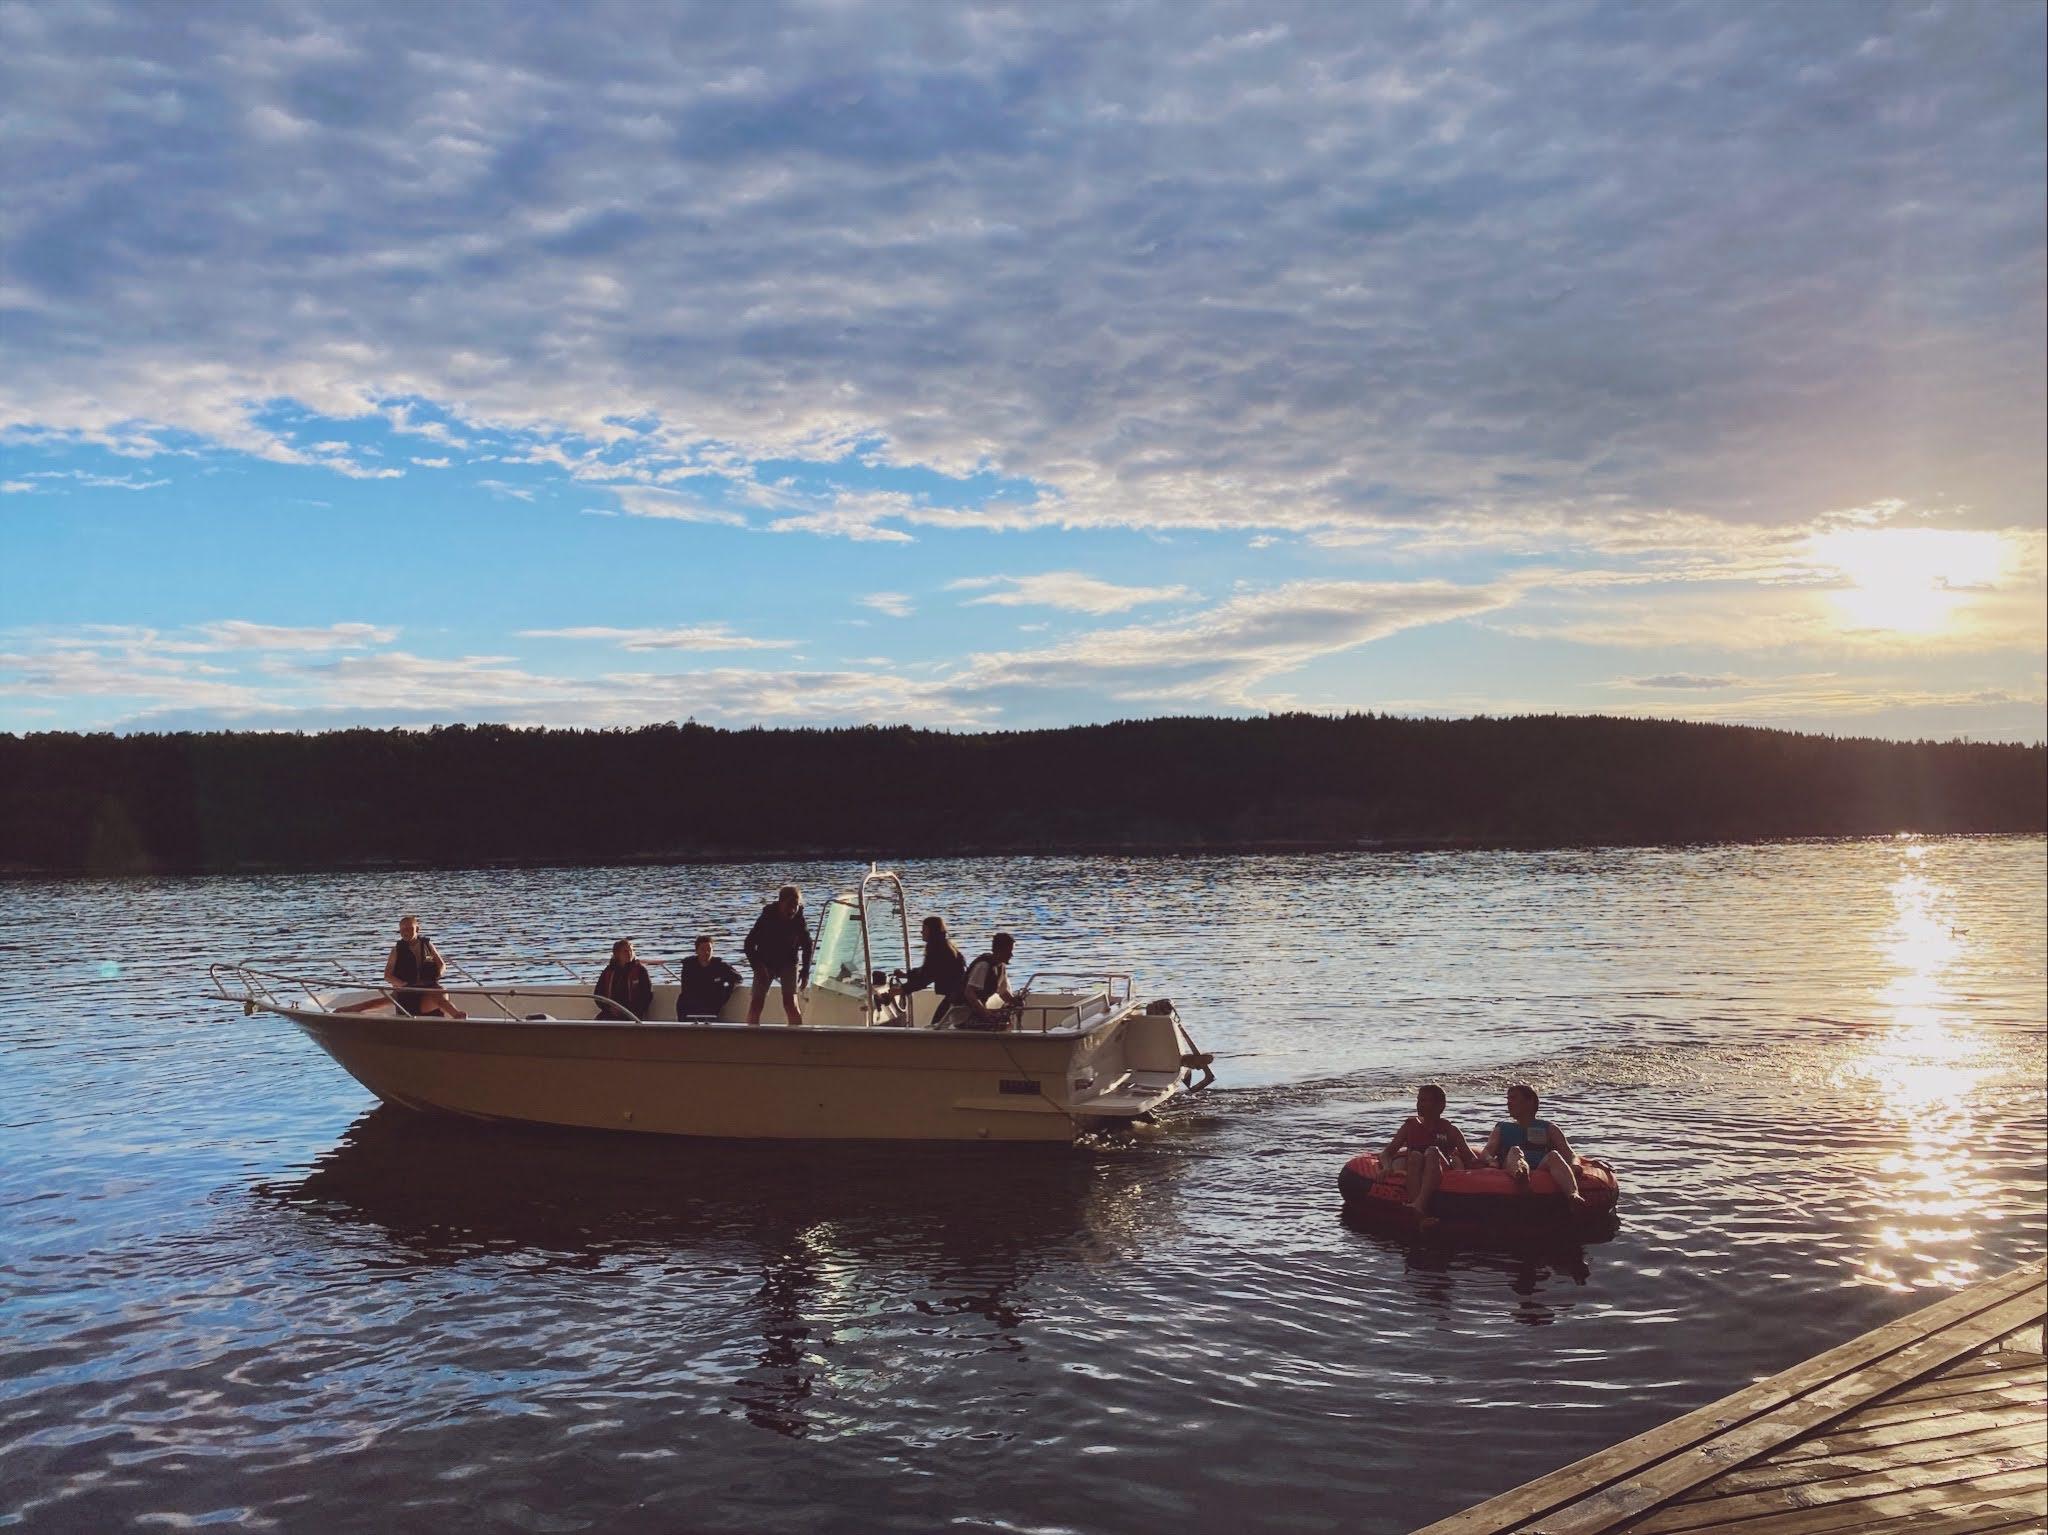 Ternen båt